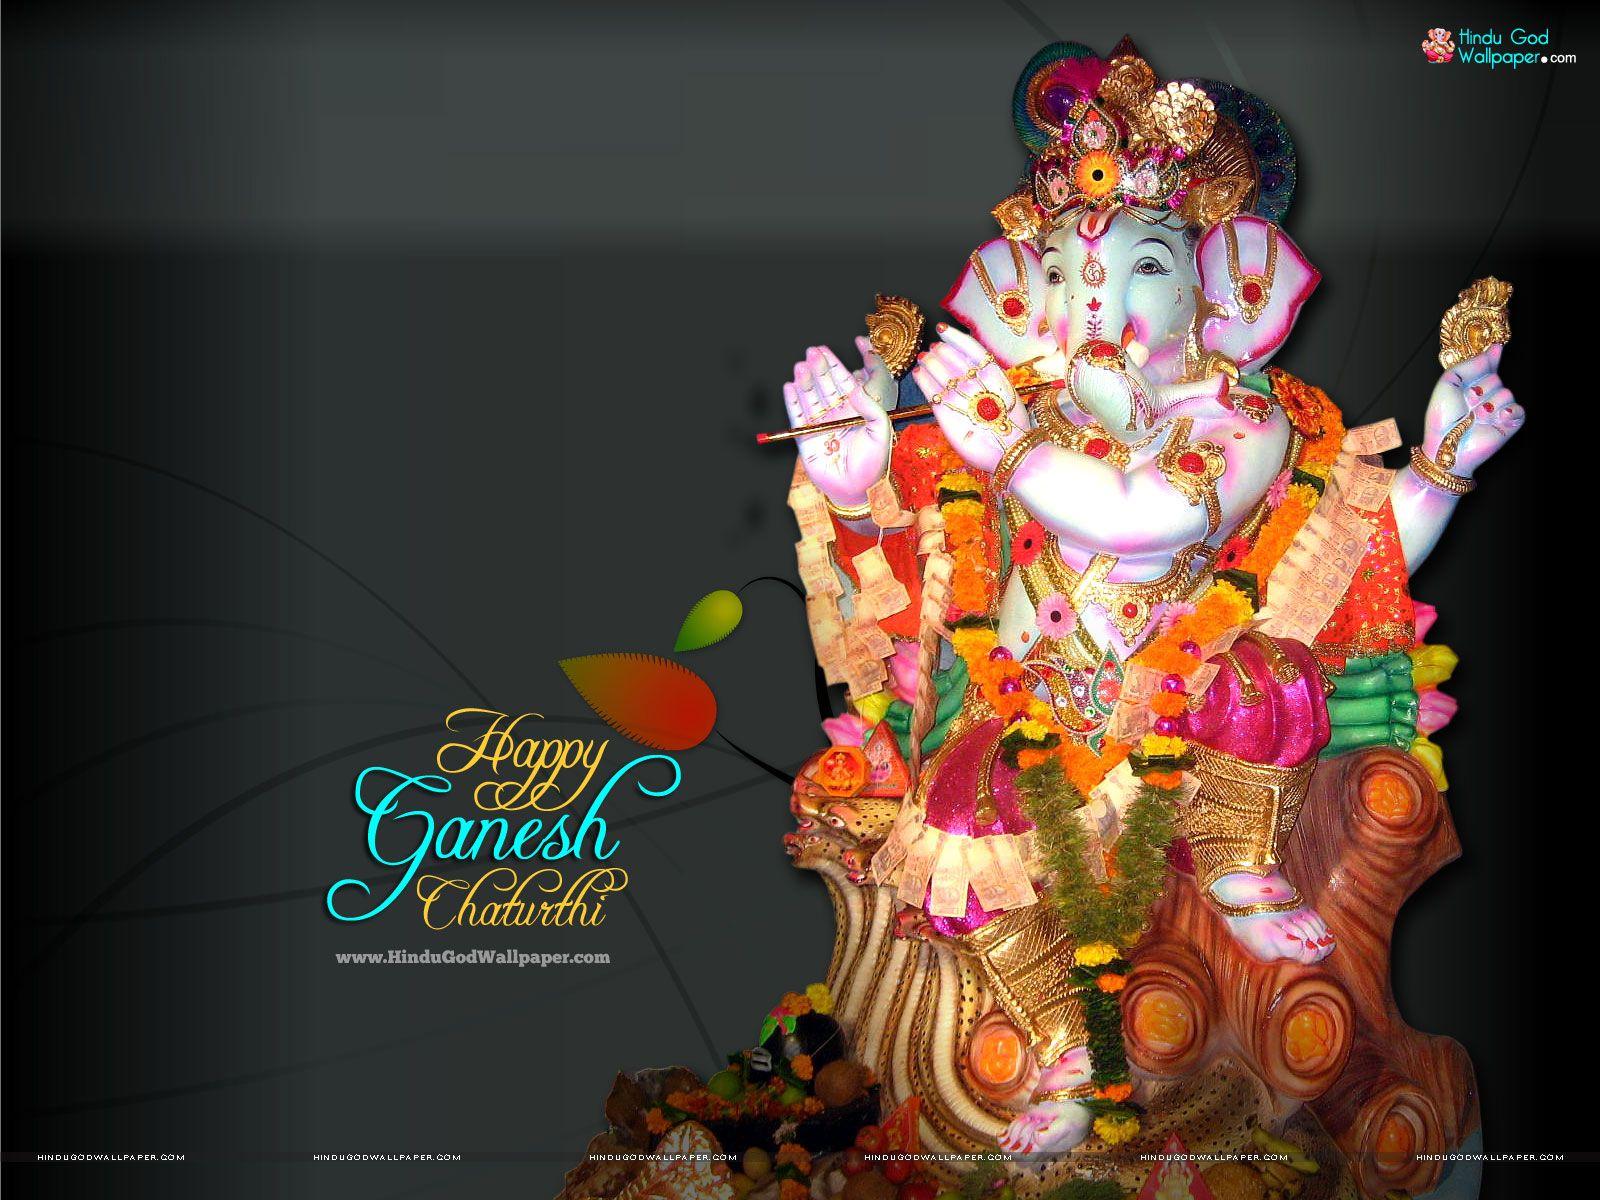 Happy Ganesh Chaturthi Hd Wallpapers Free Download Ganesh Ganesh